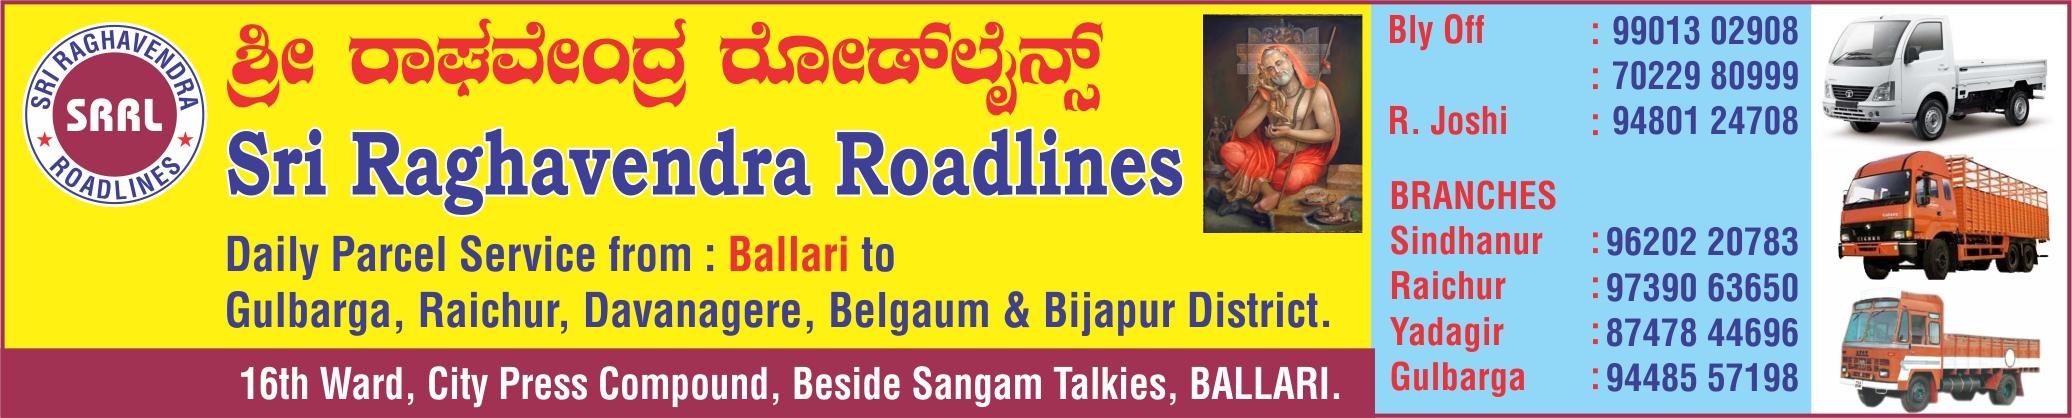 Sri Raghavendra Roadlines